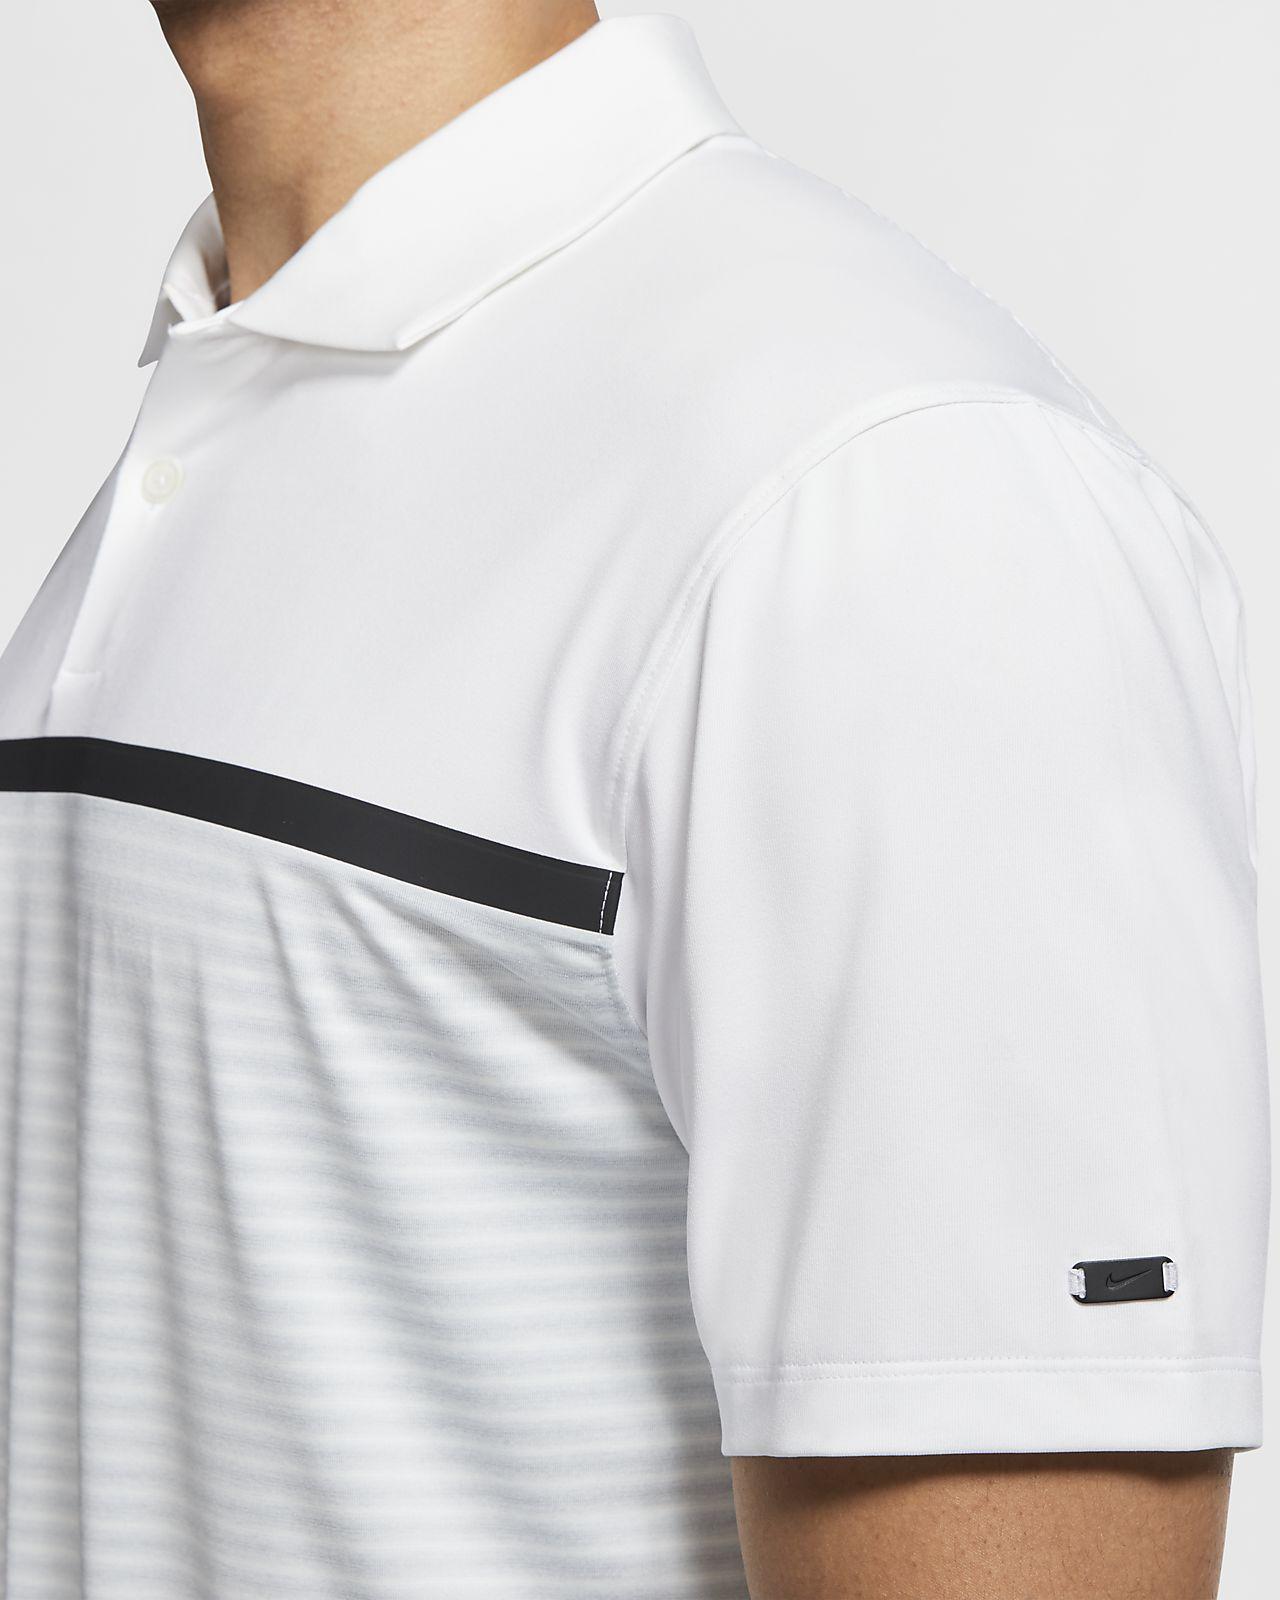 6f50beae Nike Dri-FIT Tiger Woods Vapor Men's Striped Golf Polo